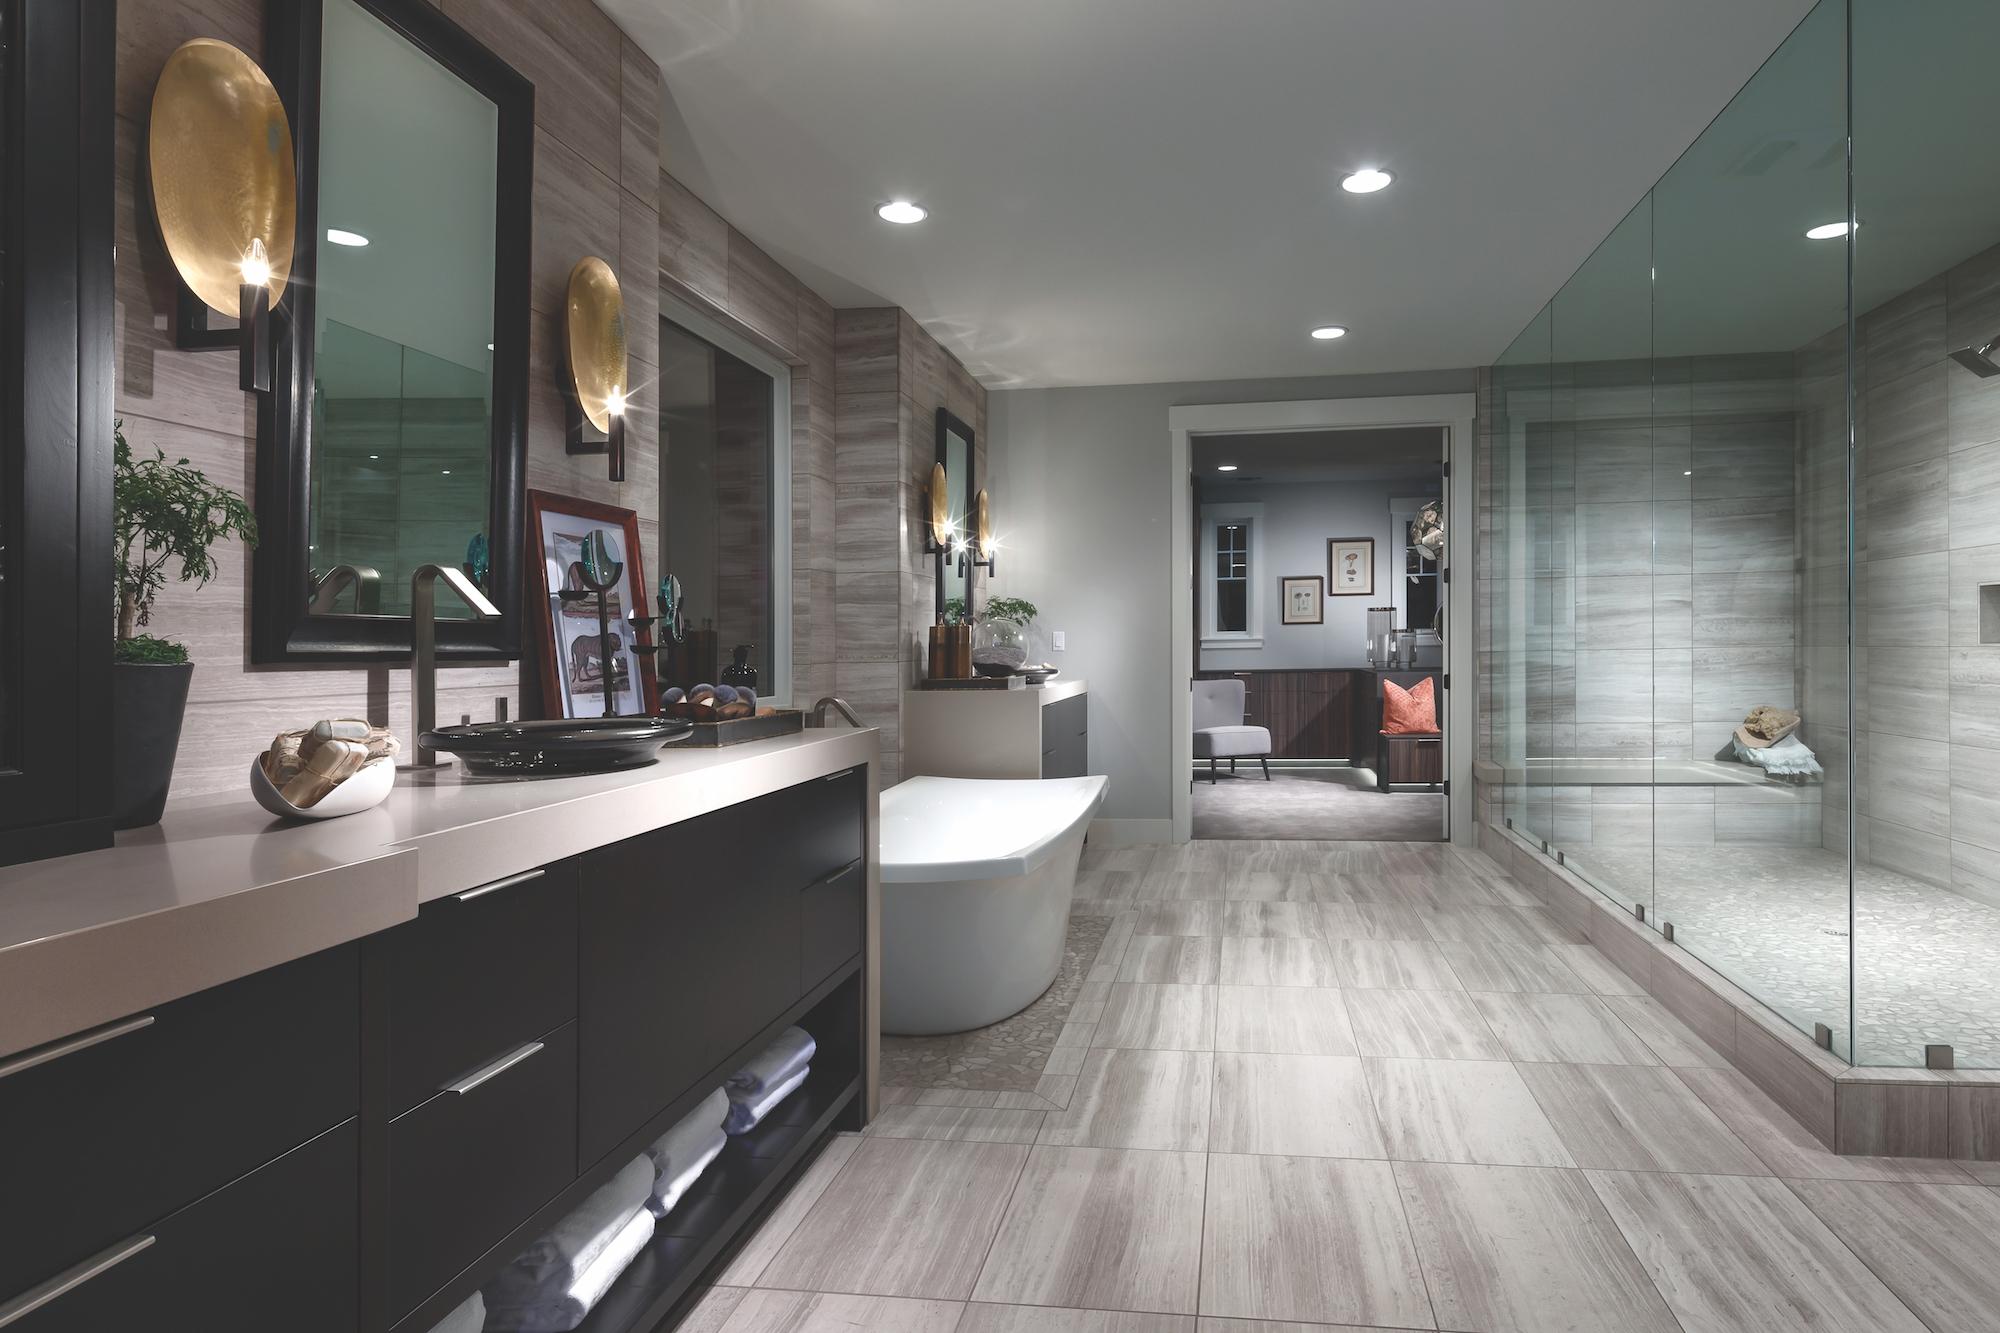 25 Luxury Bathroom Ideas & Designs | Build Beautiful on Beautiful Bathroom Ideas  id=54656